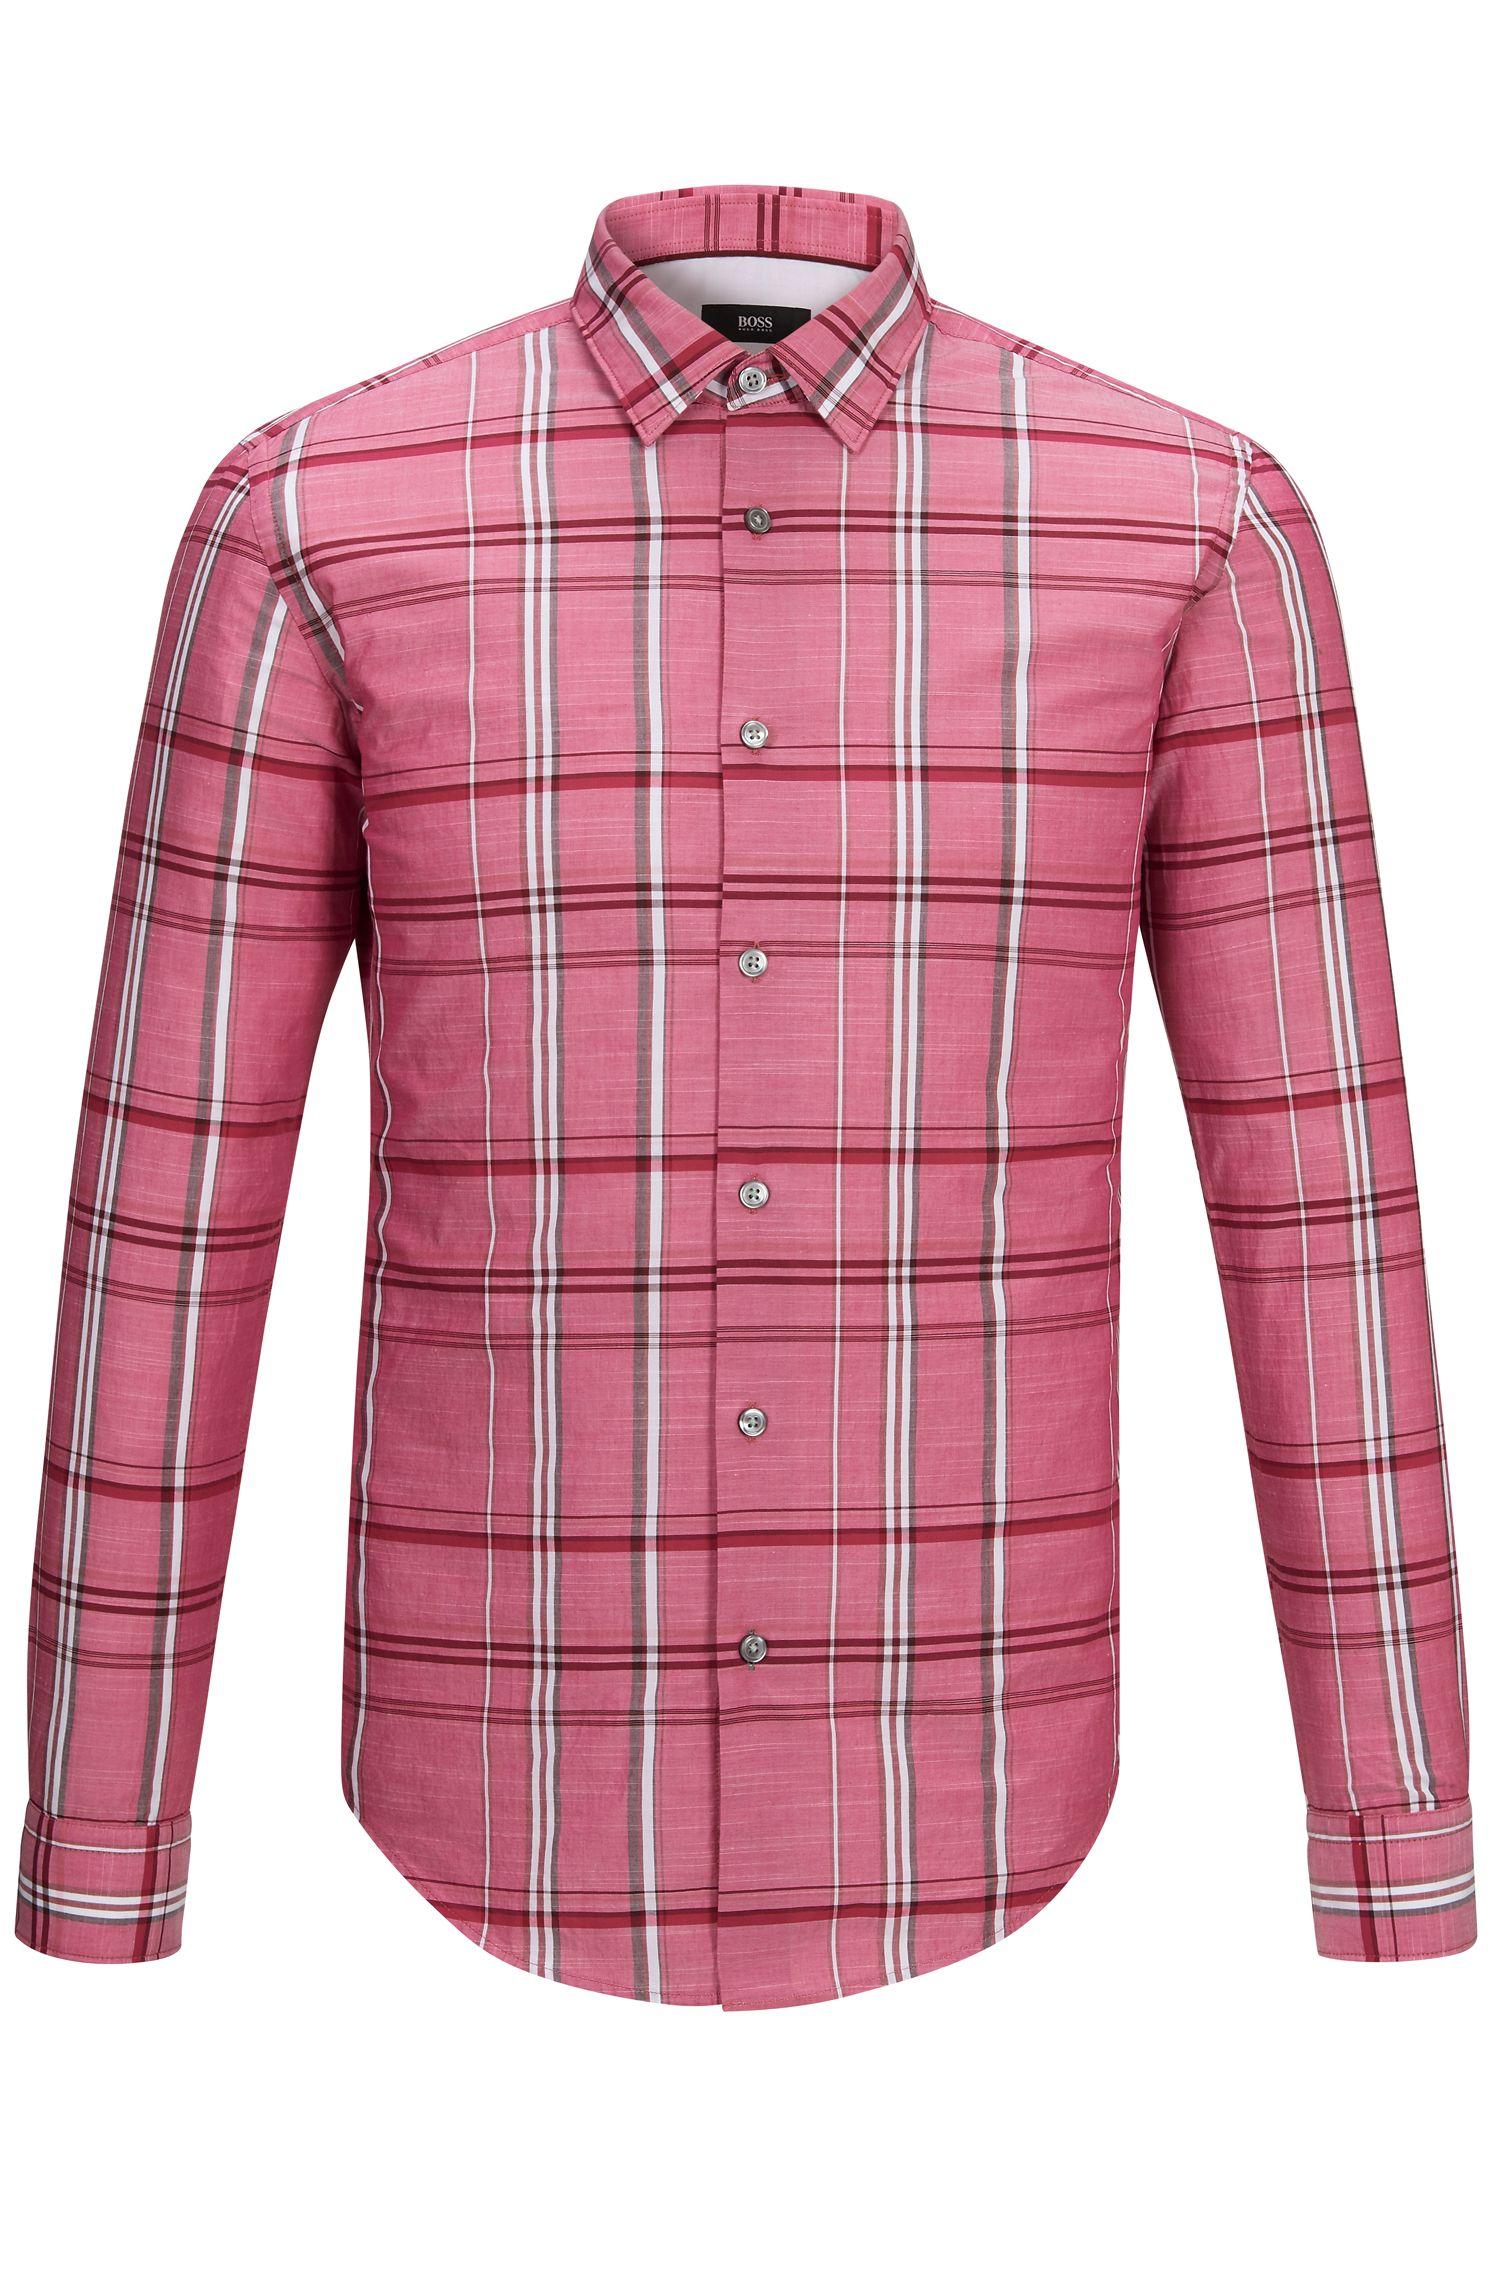 Plaid Cotton Button Down Shirt, Slim Fit   Ronni